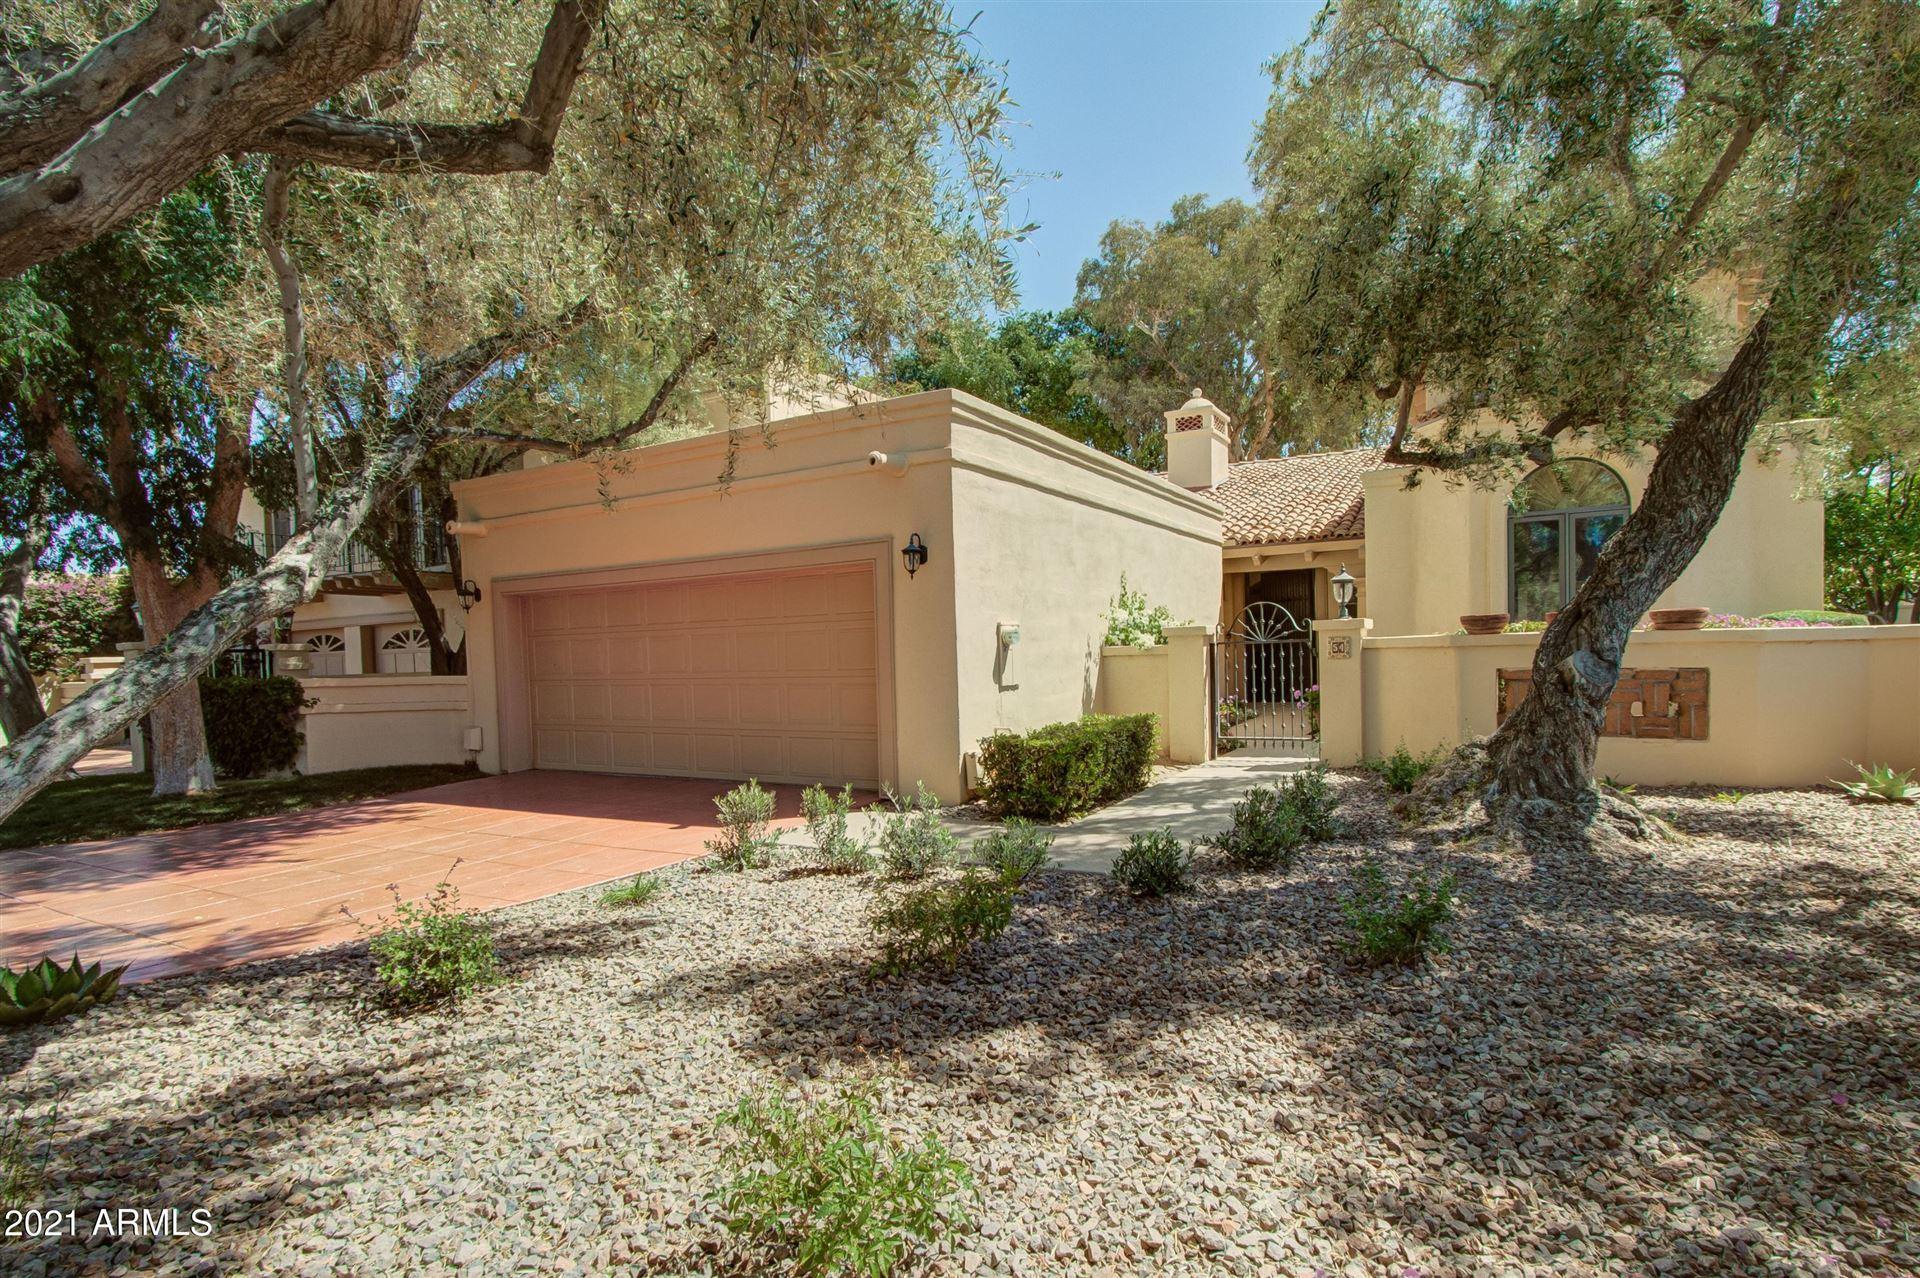 7500 E MCCORMICK Parkway #54, Scottsdale, AZ 85258 - MLS#: 6225813